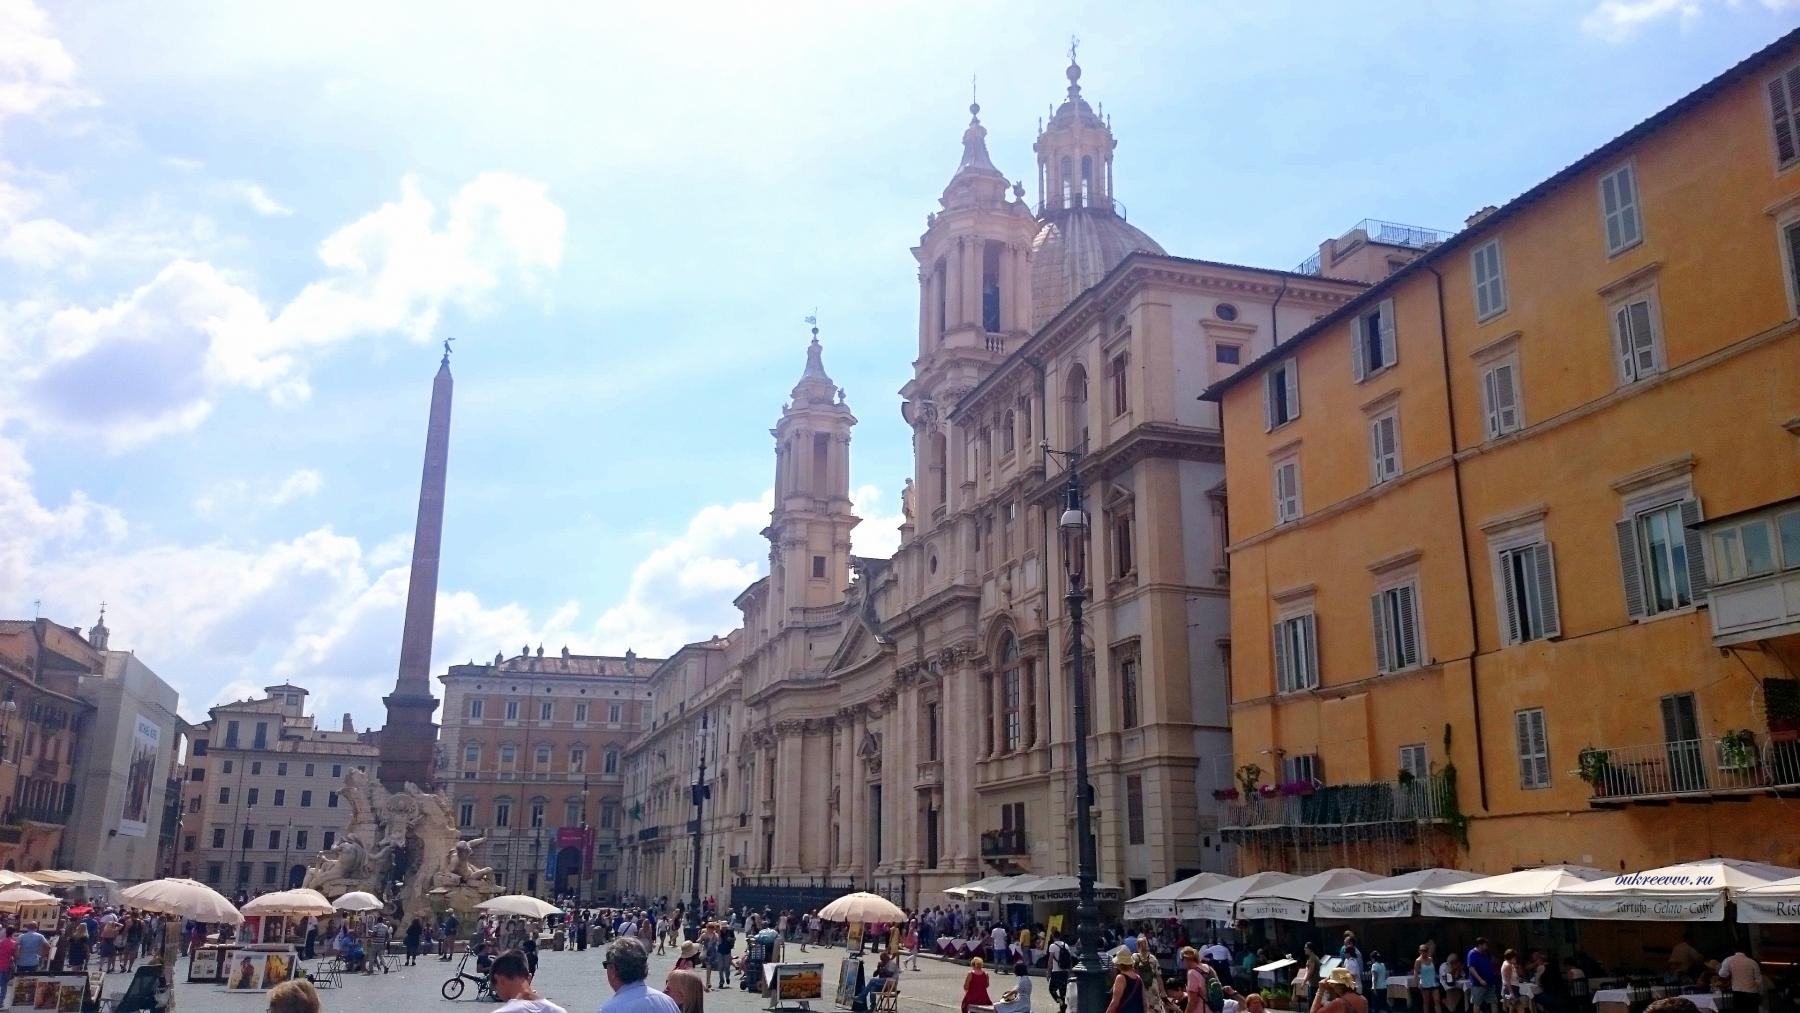 Piazza Navona 87